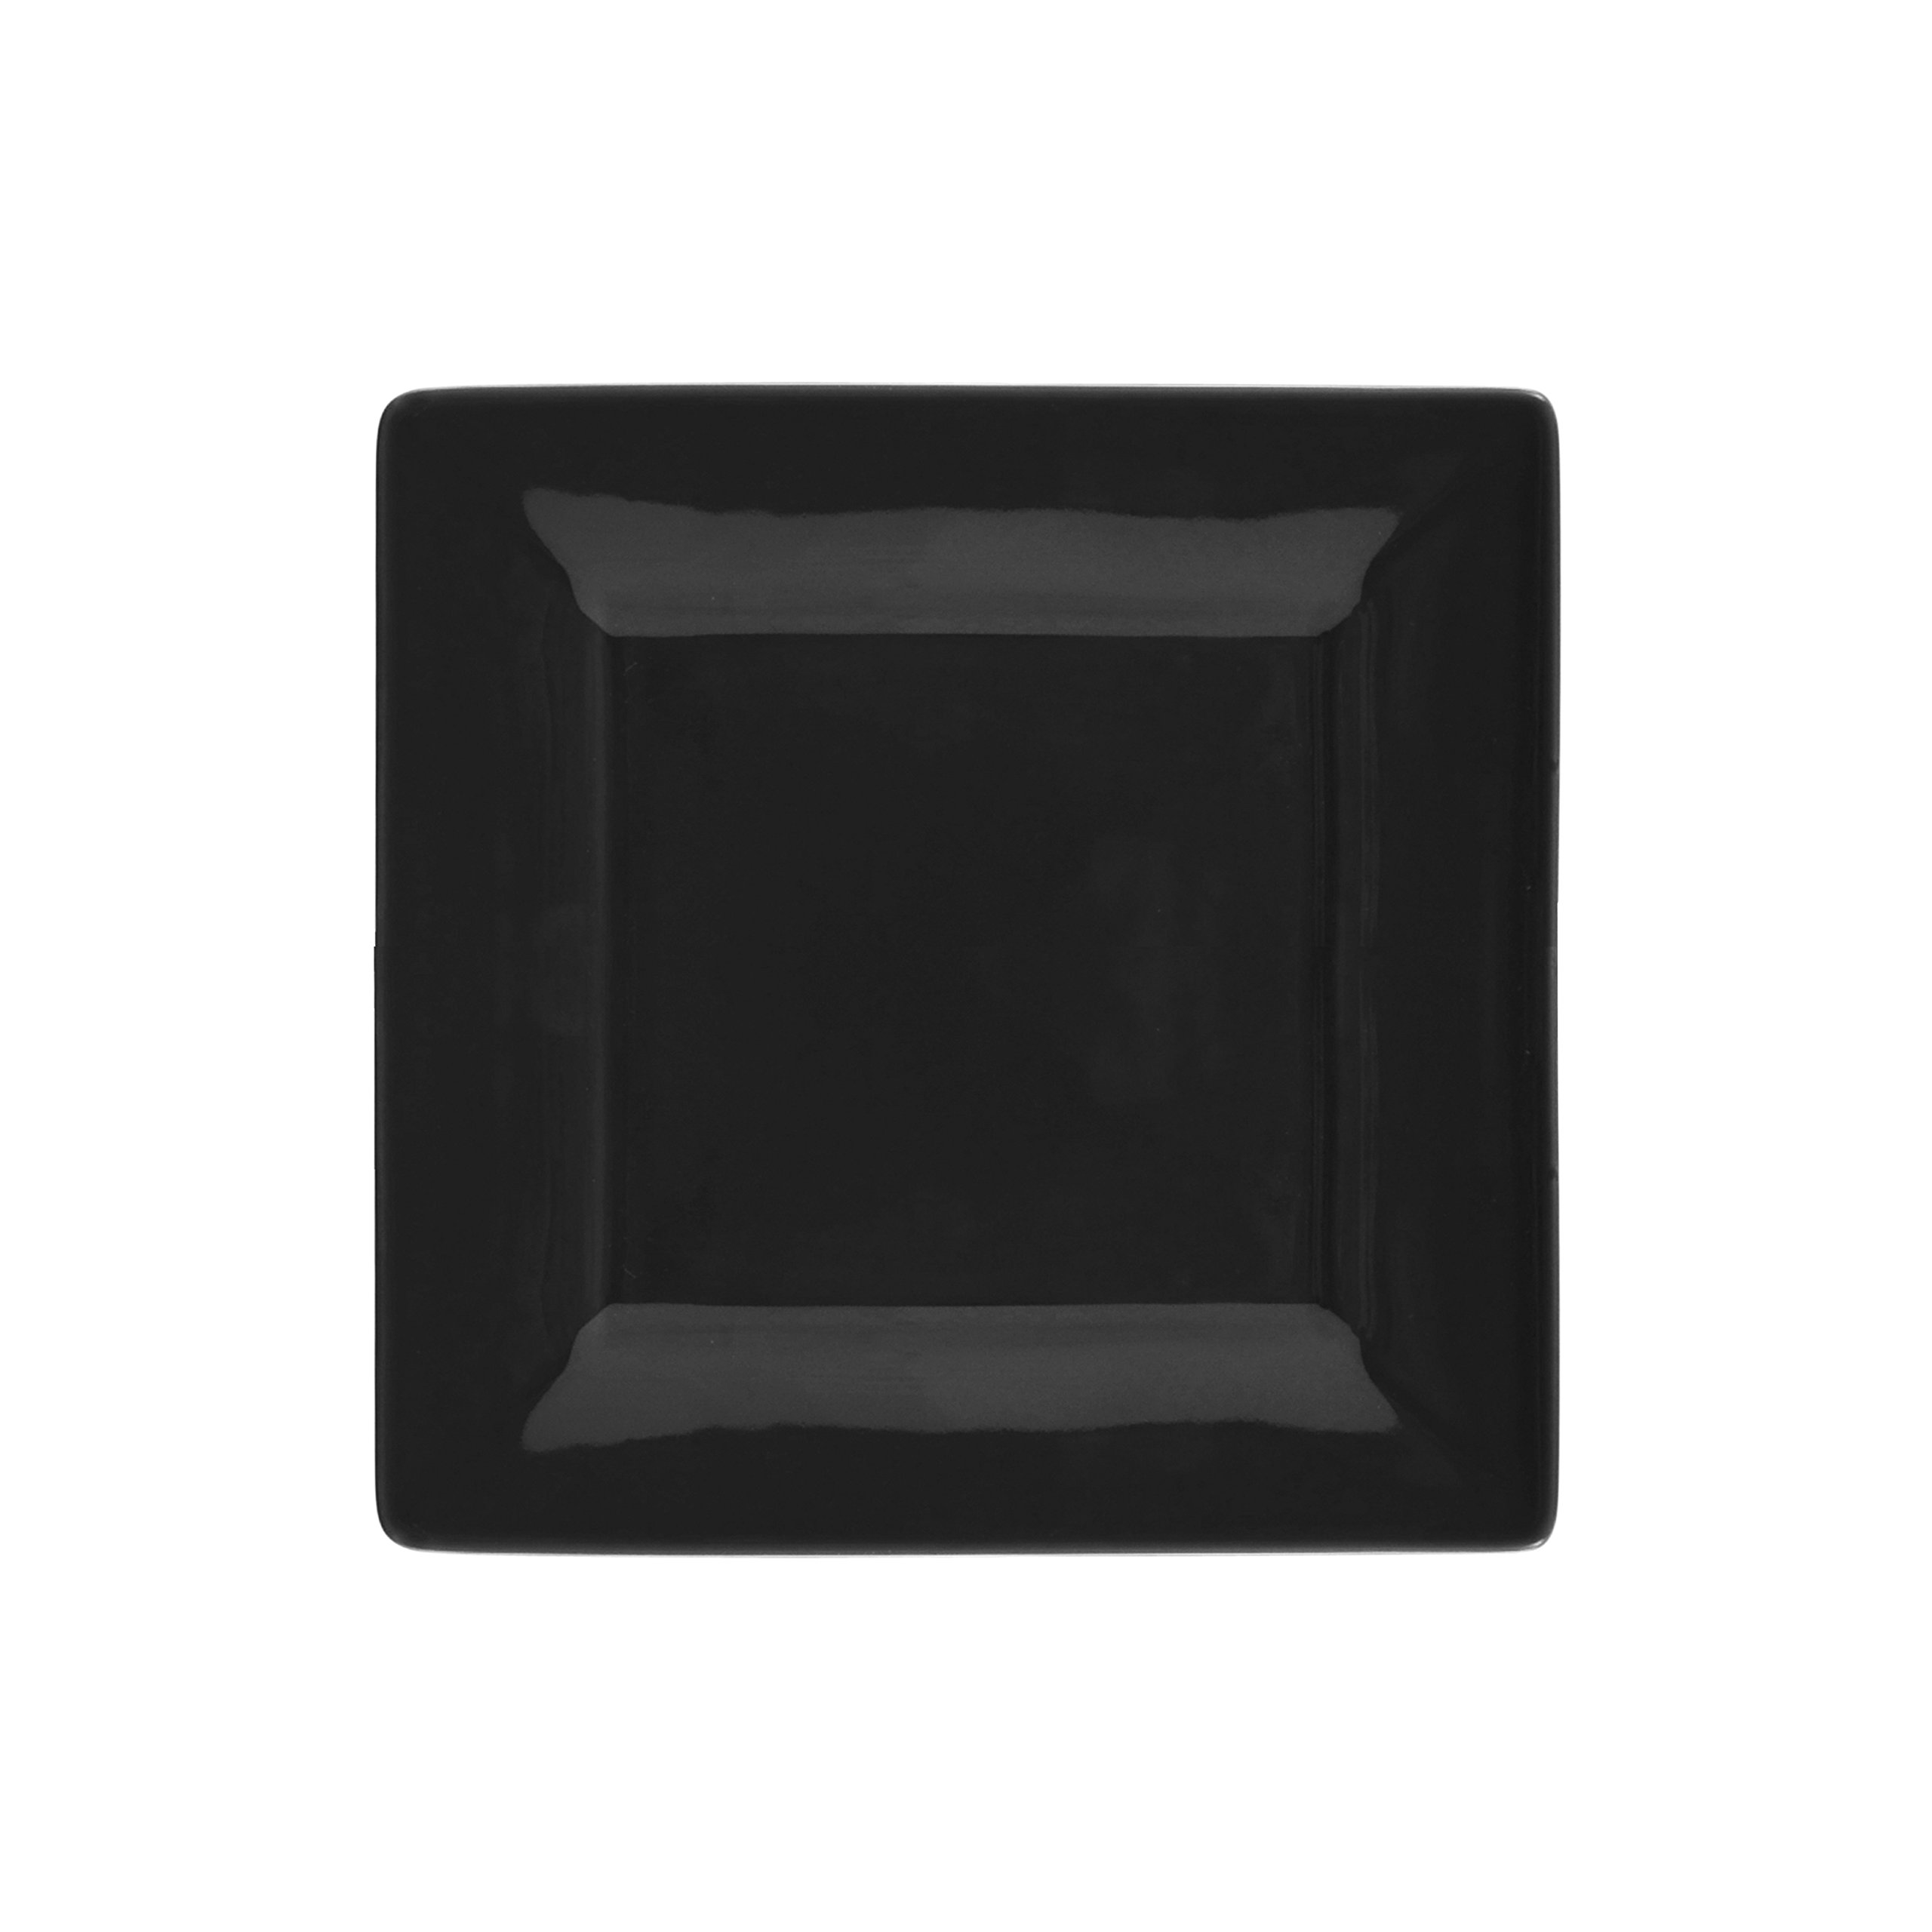 10 Strawberry Street Square 16 Piece Dinnerware Set, Black by 10 Strawberry Street (Image #3)